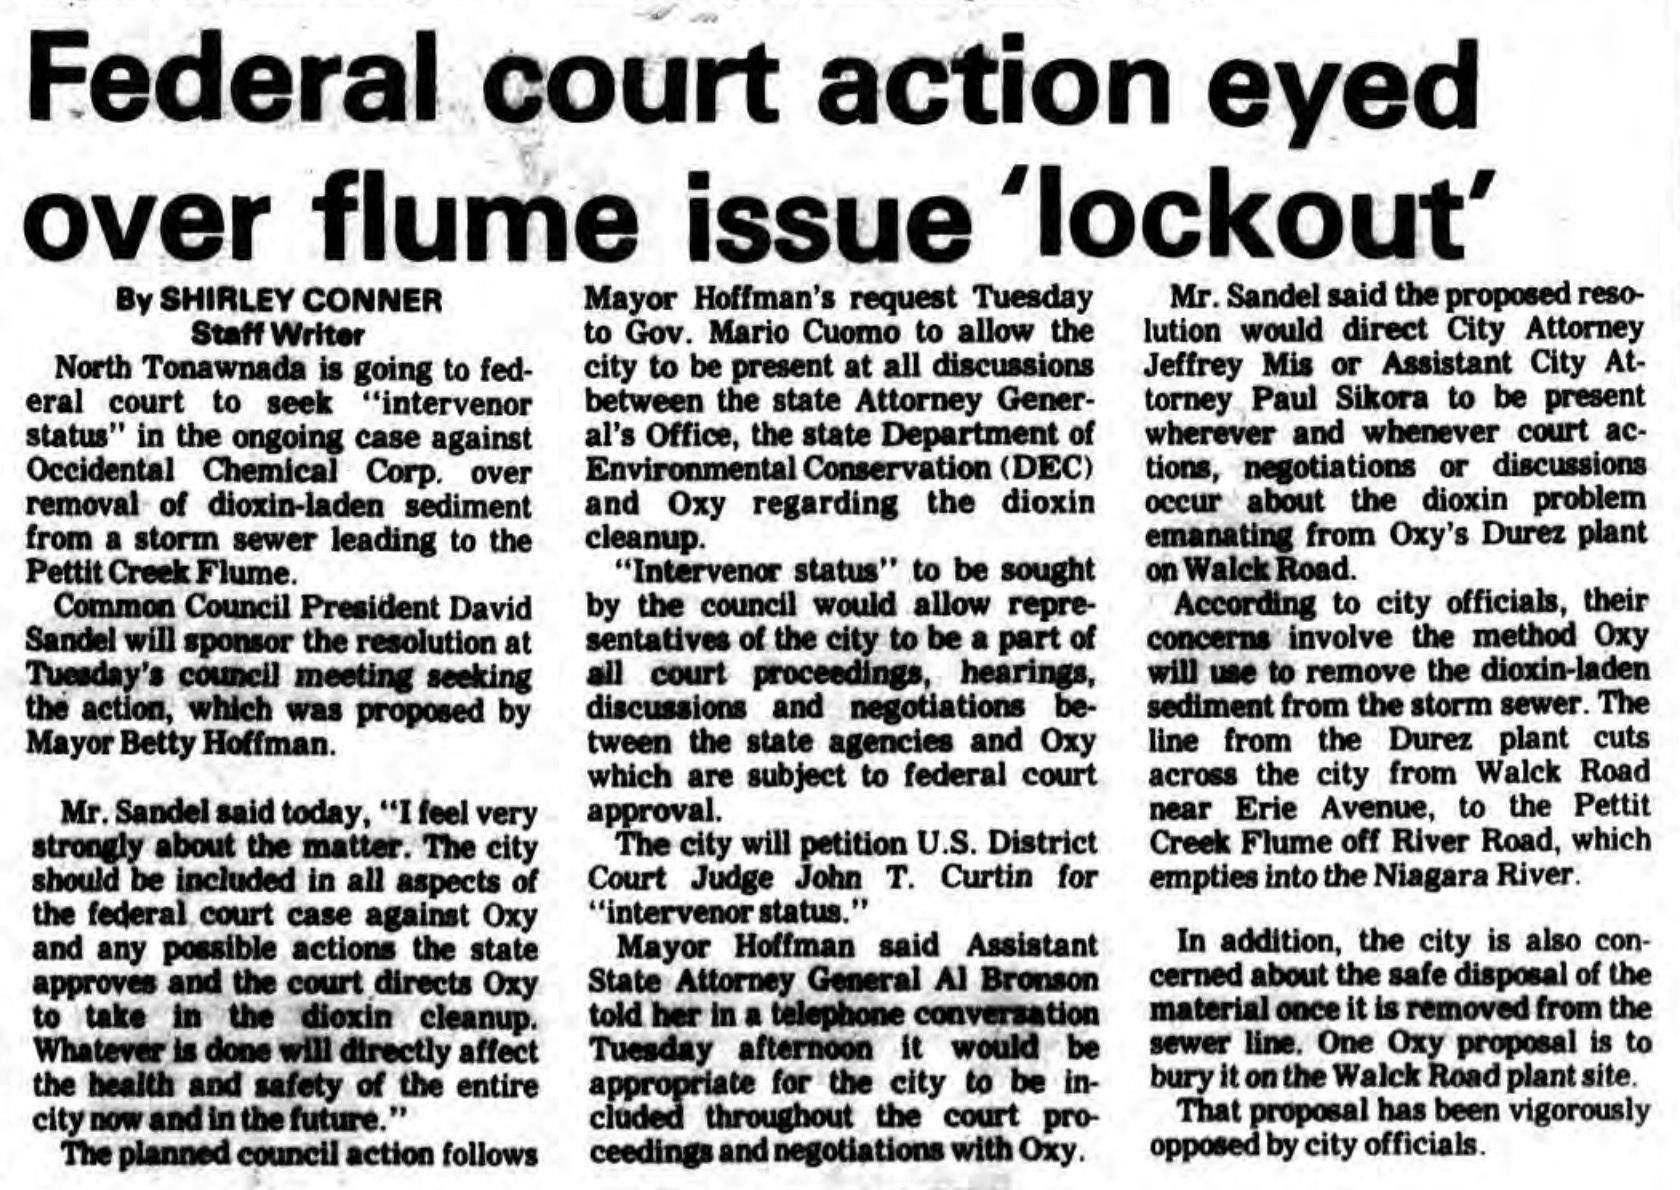 Federal court action eyed over Pettit flume lockout, Durez, article(Ton News, 1986-10-29).jpg